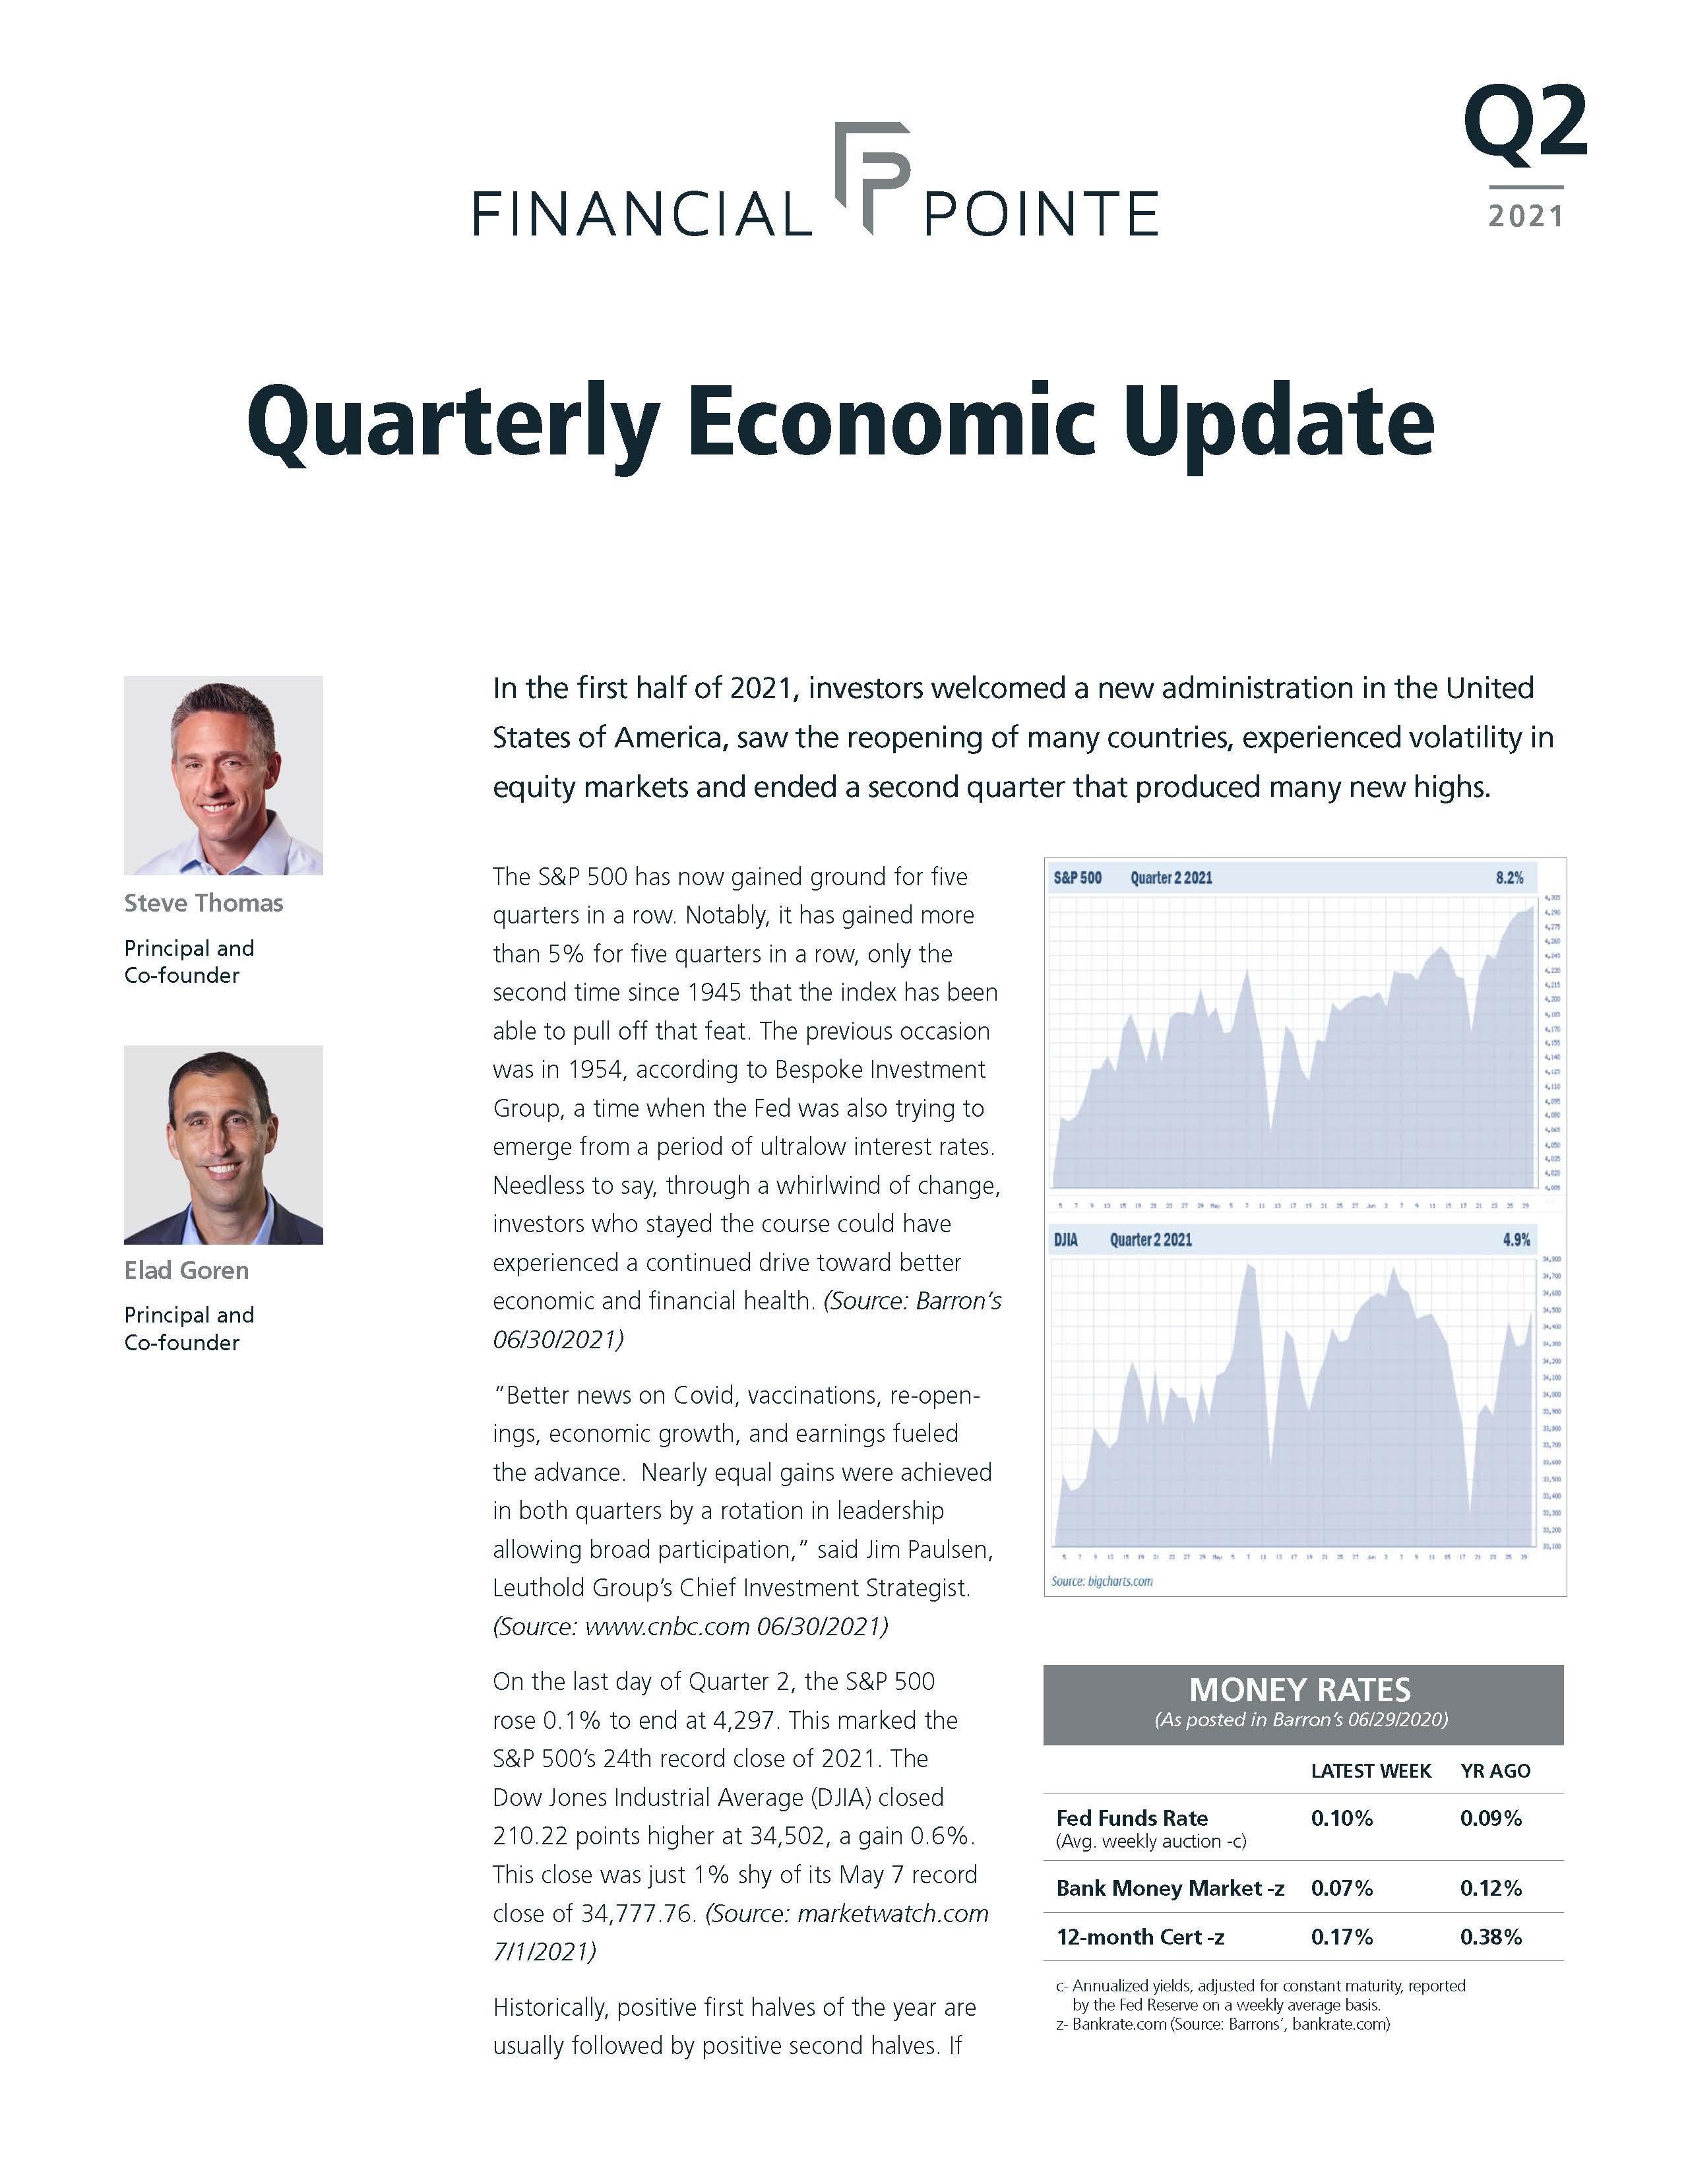 Quarterly Economic Update - Q2 2021 Thumbnail